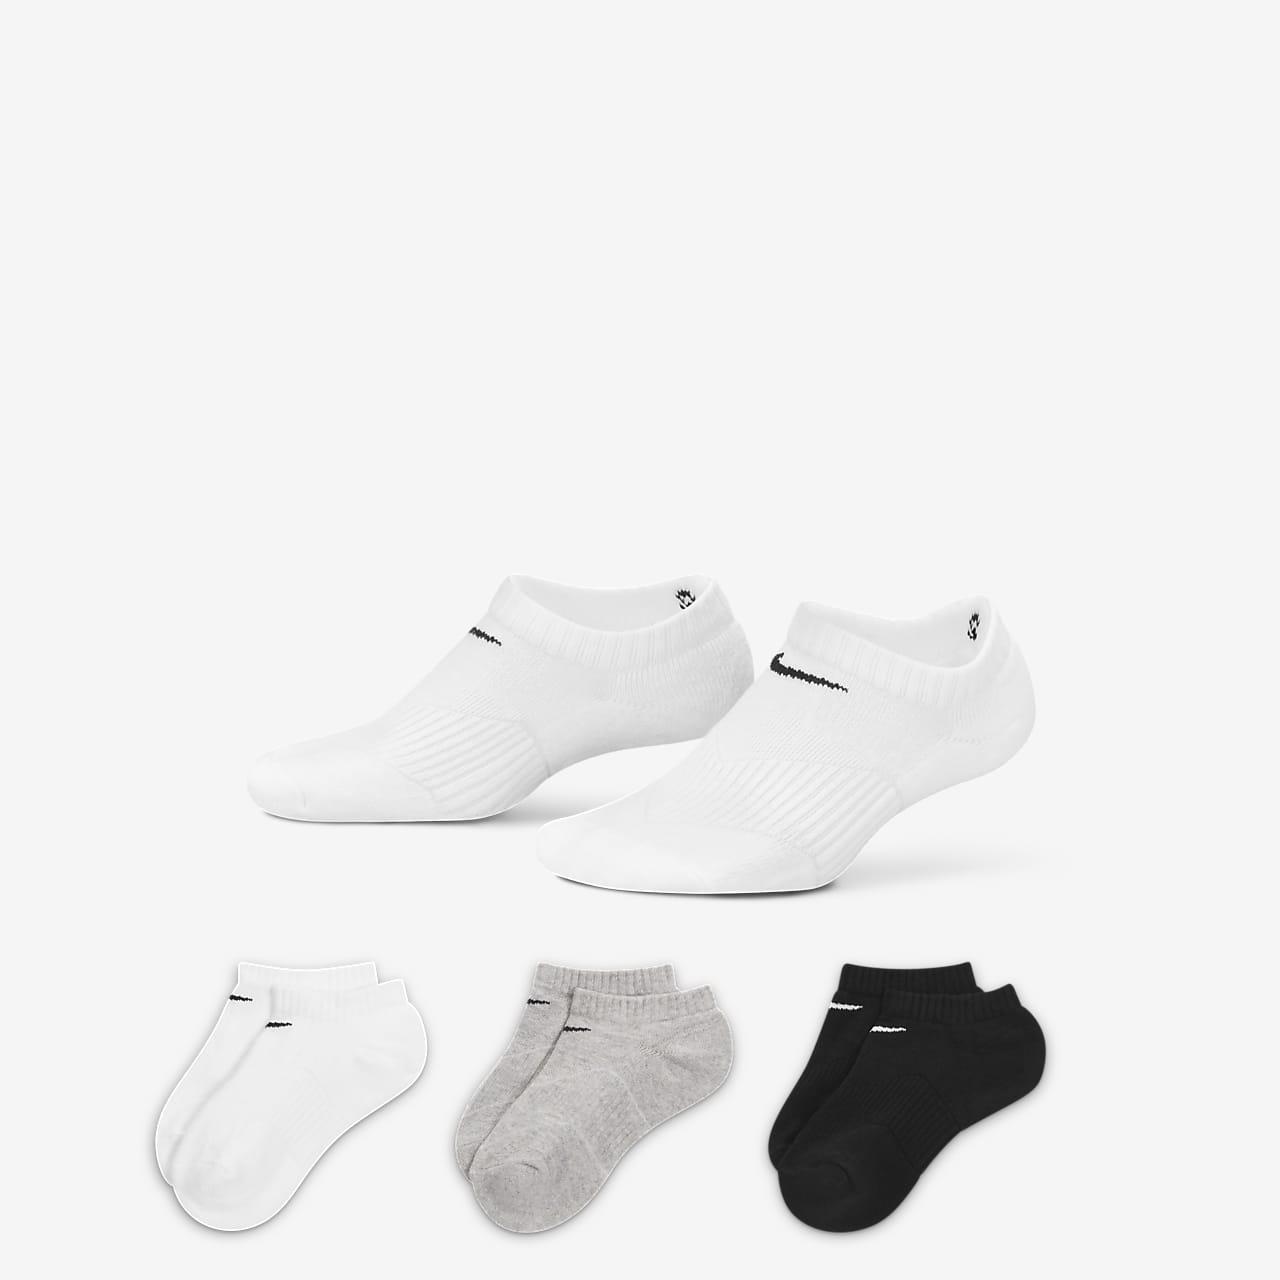 Nike Performance Cushion No-Show sokker for store barn (3 par)